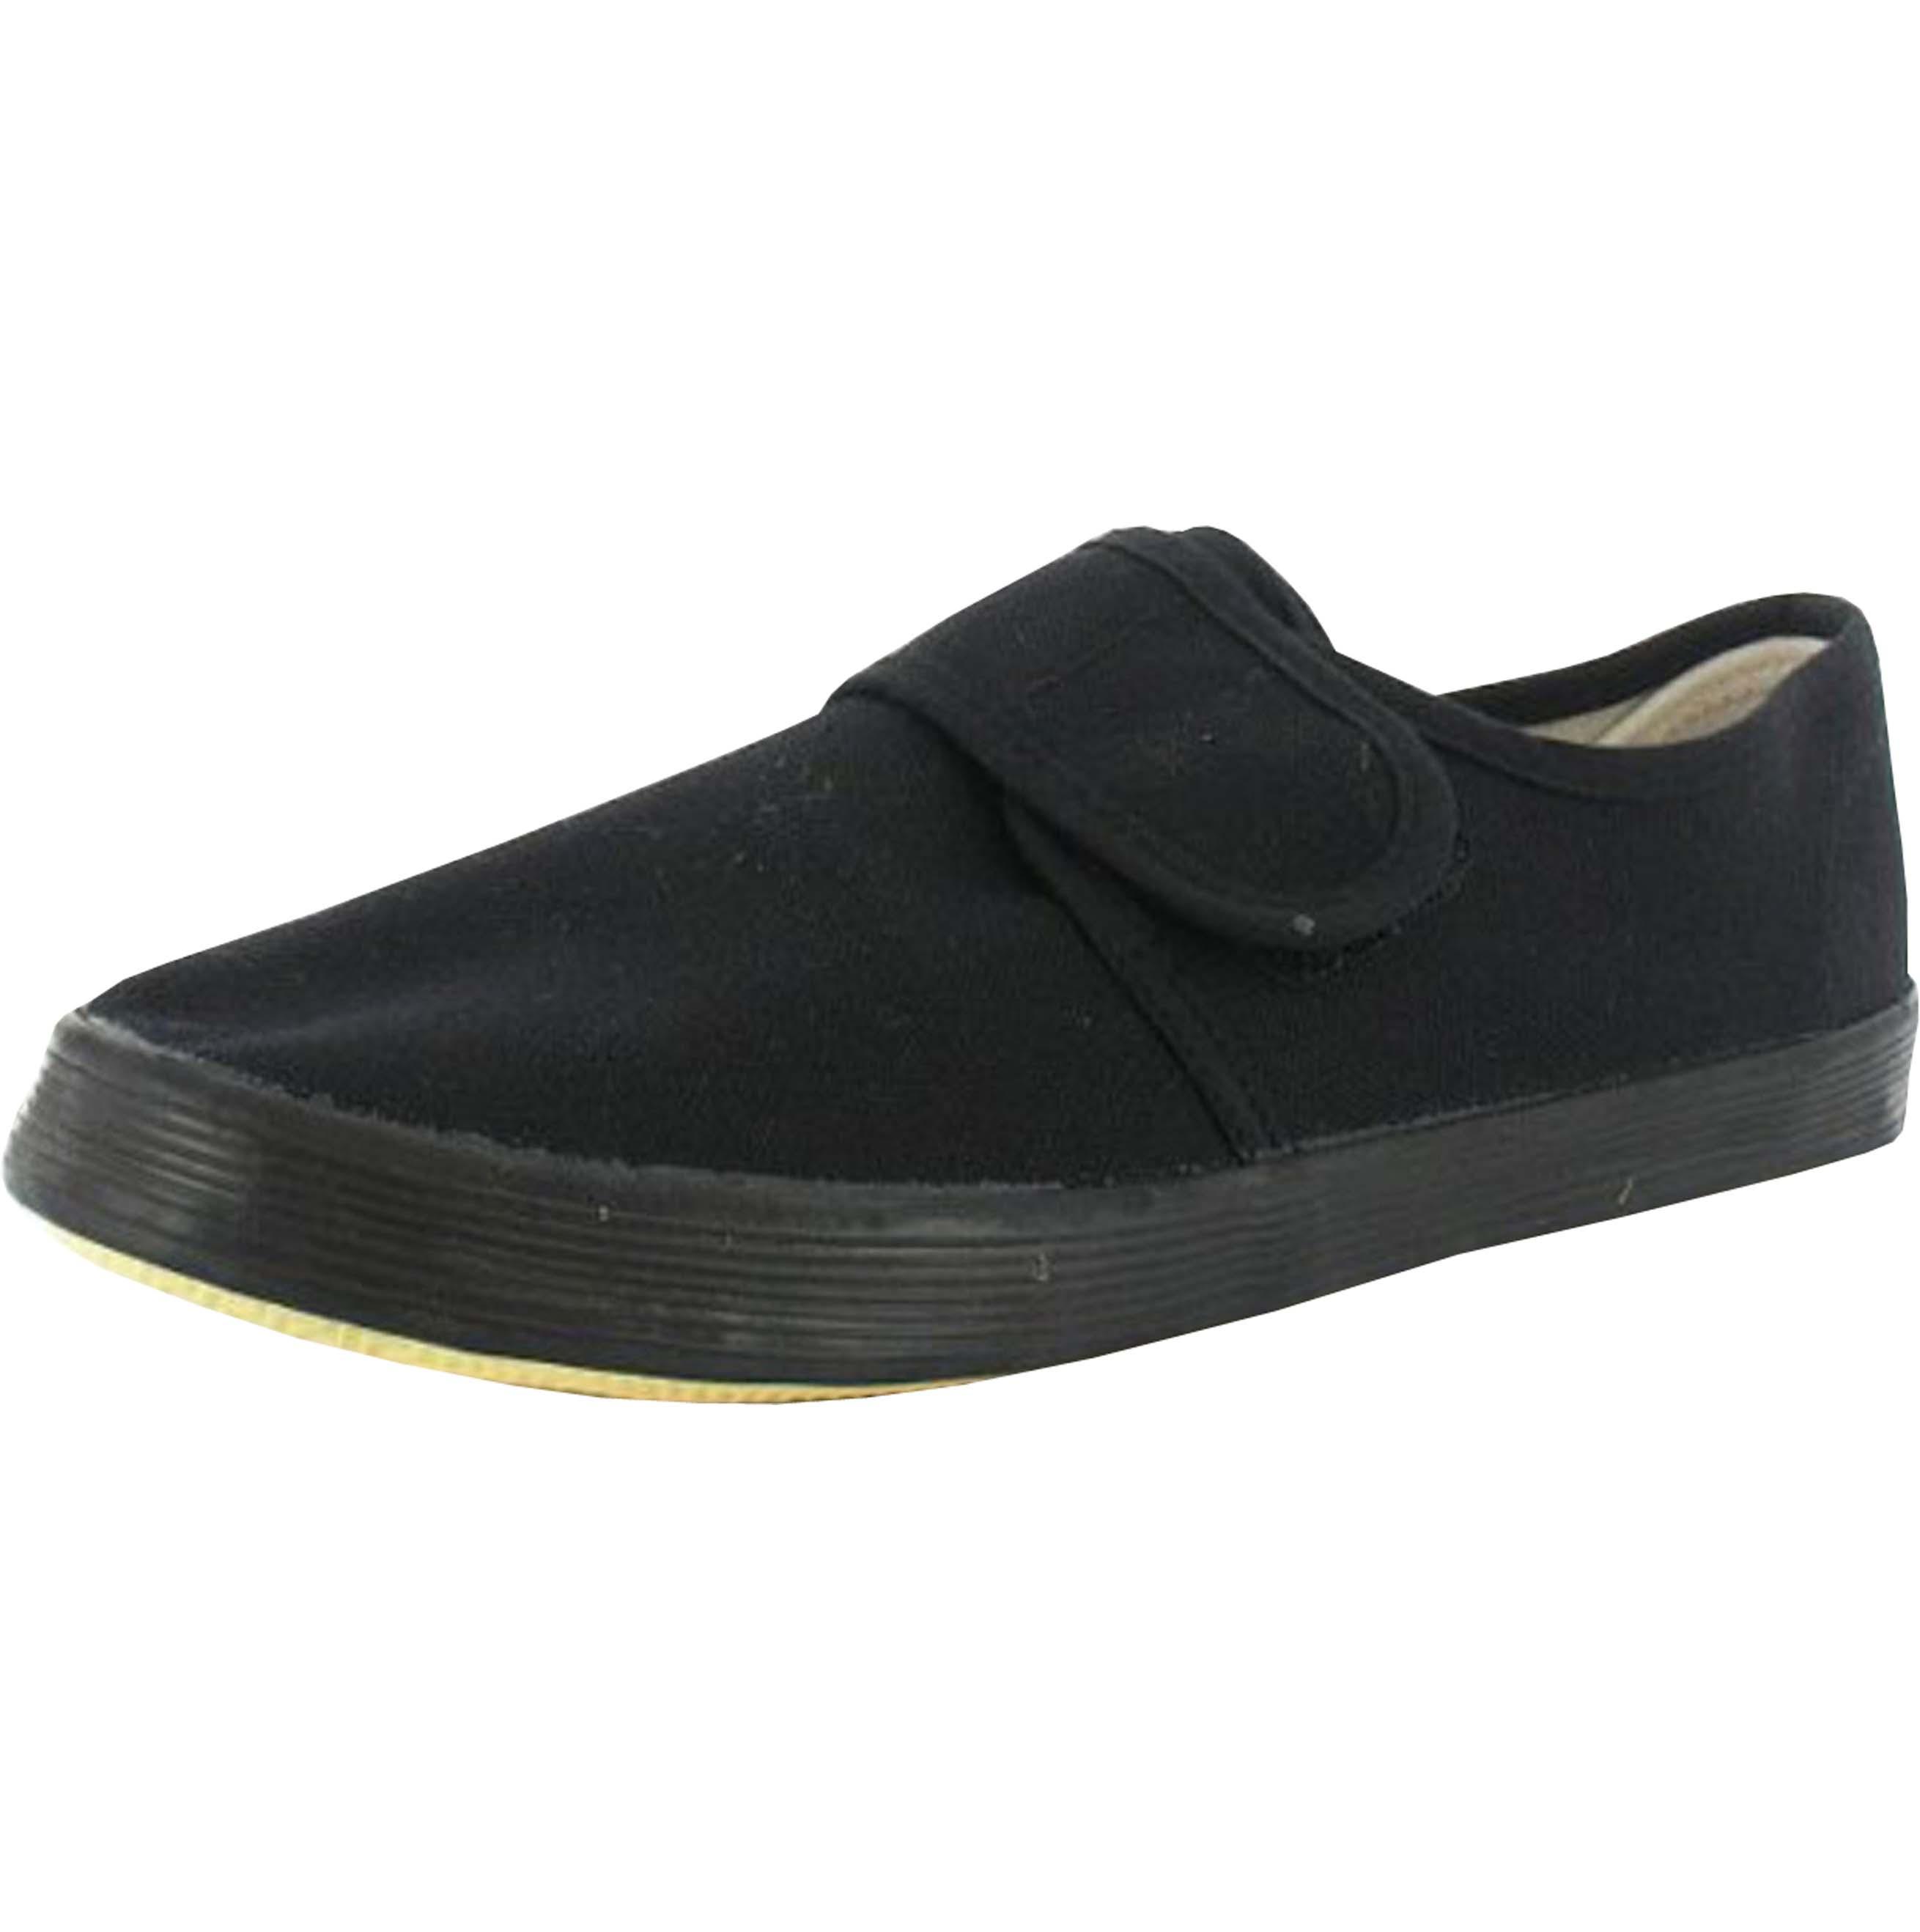 Nursery Velcro Fastening Gym Shoes